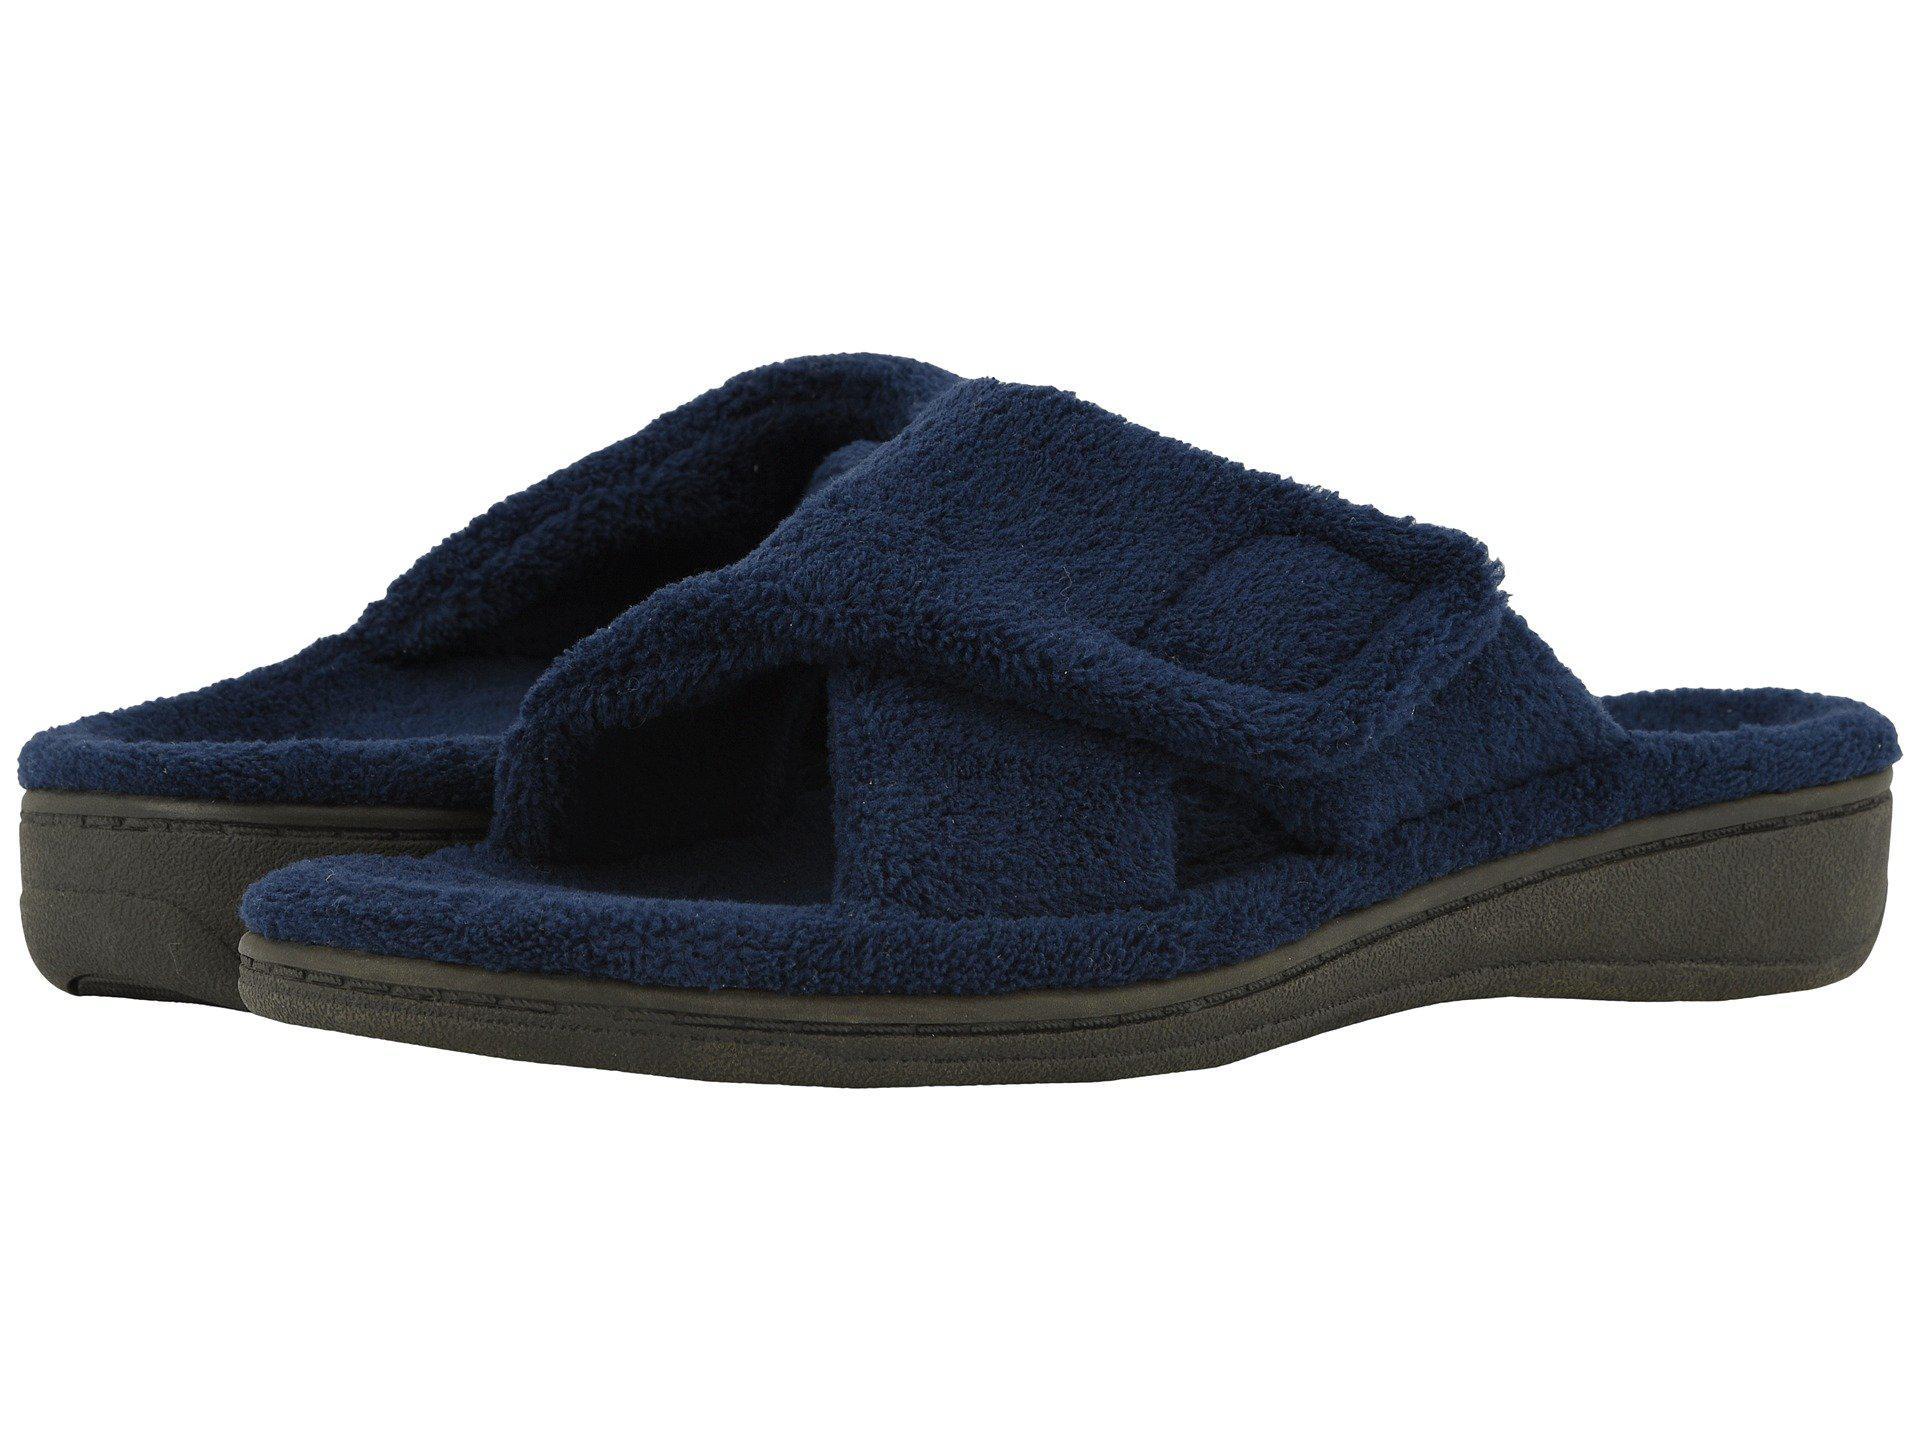 3c902271a9e2 Lyst - Vionic Relax (light Grey) Women s Slippers in Blue